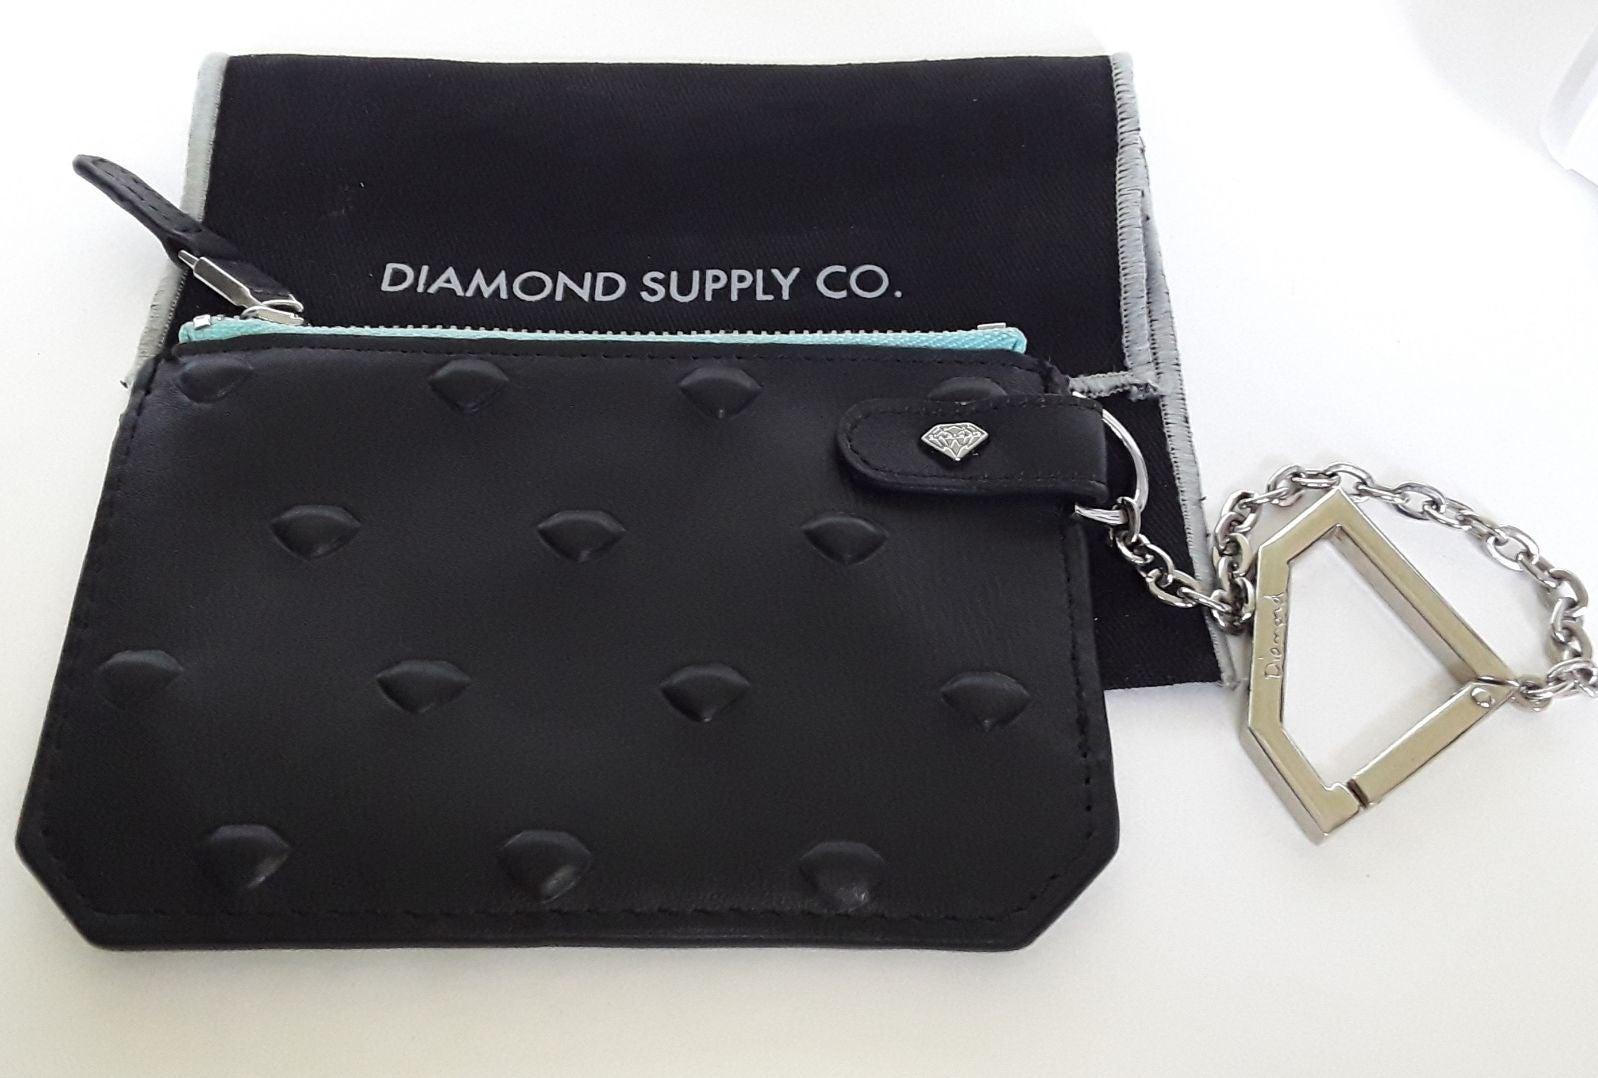 Diamond Supply Co. Keychain Wallet